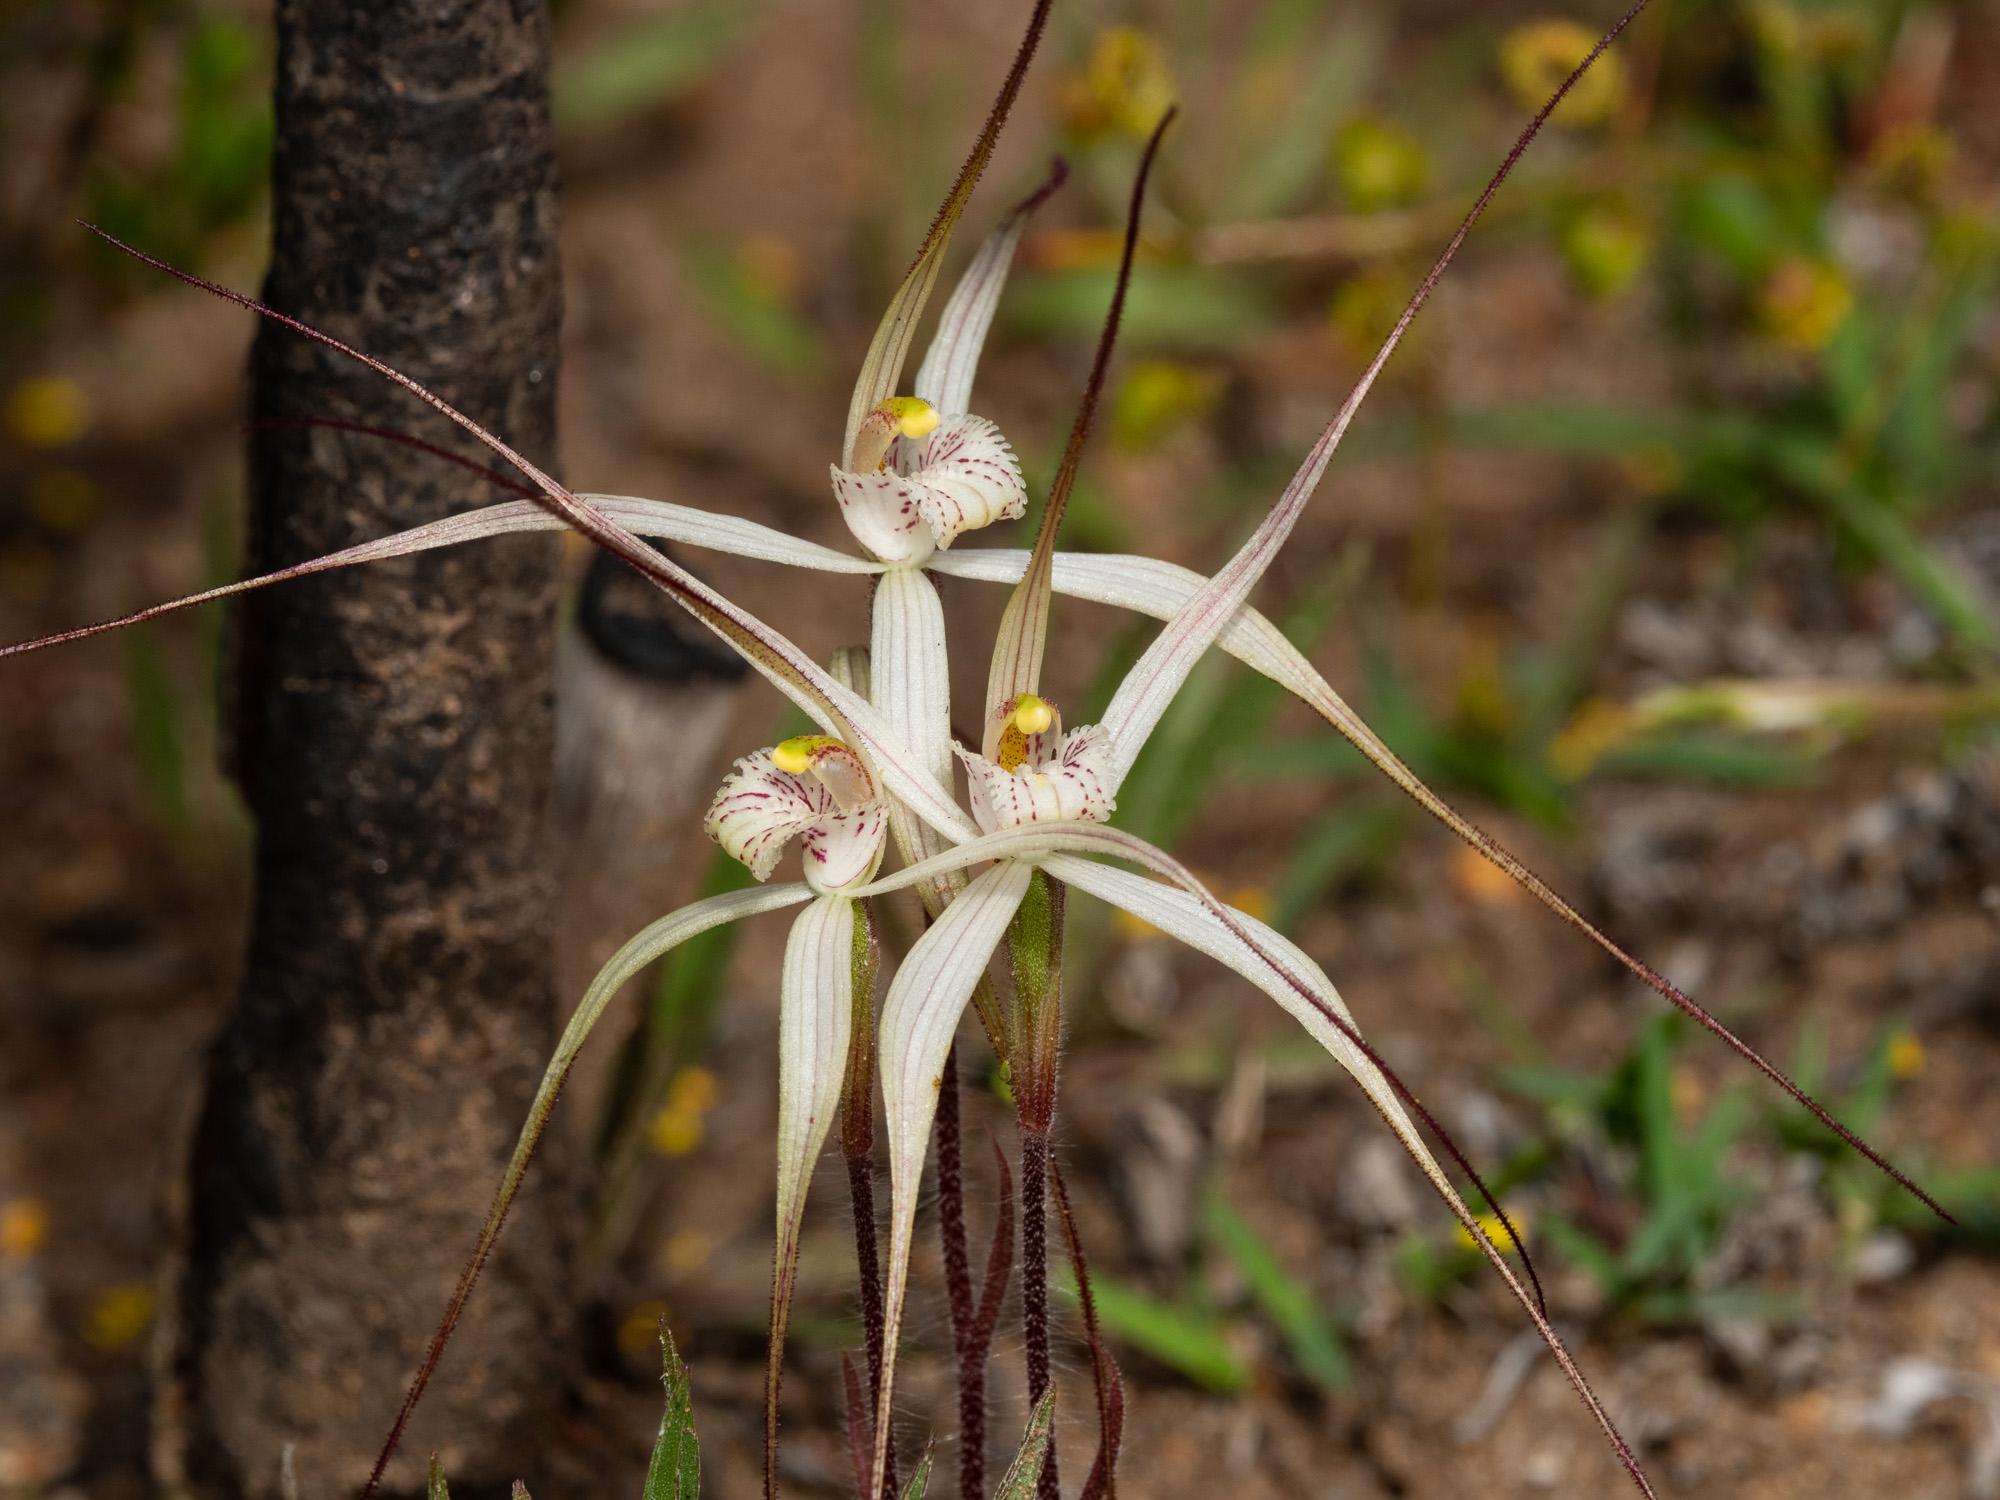 Caladenia microchila (Western Wispy Spider Orchid)